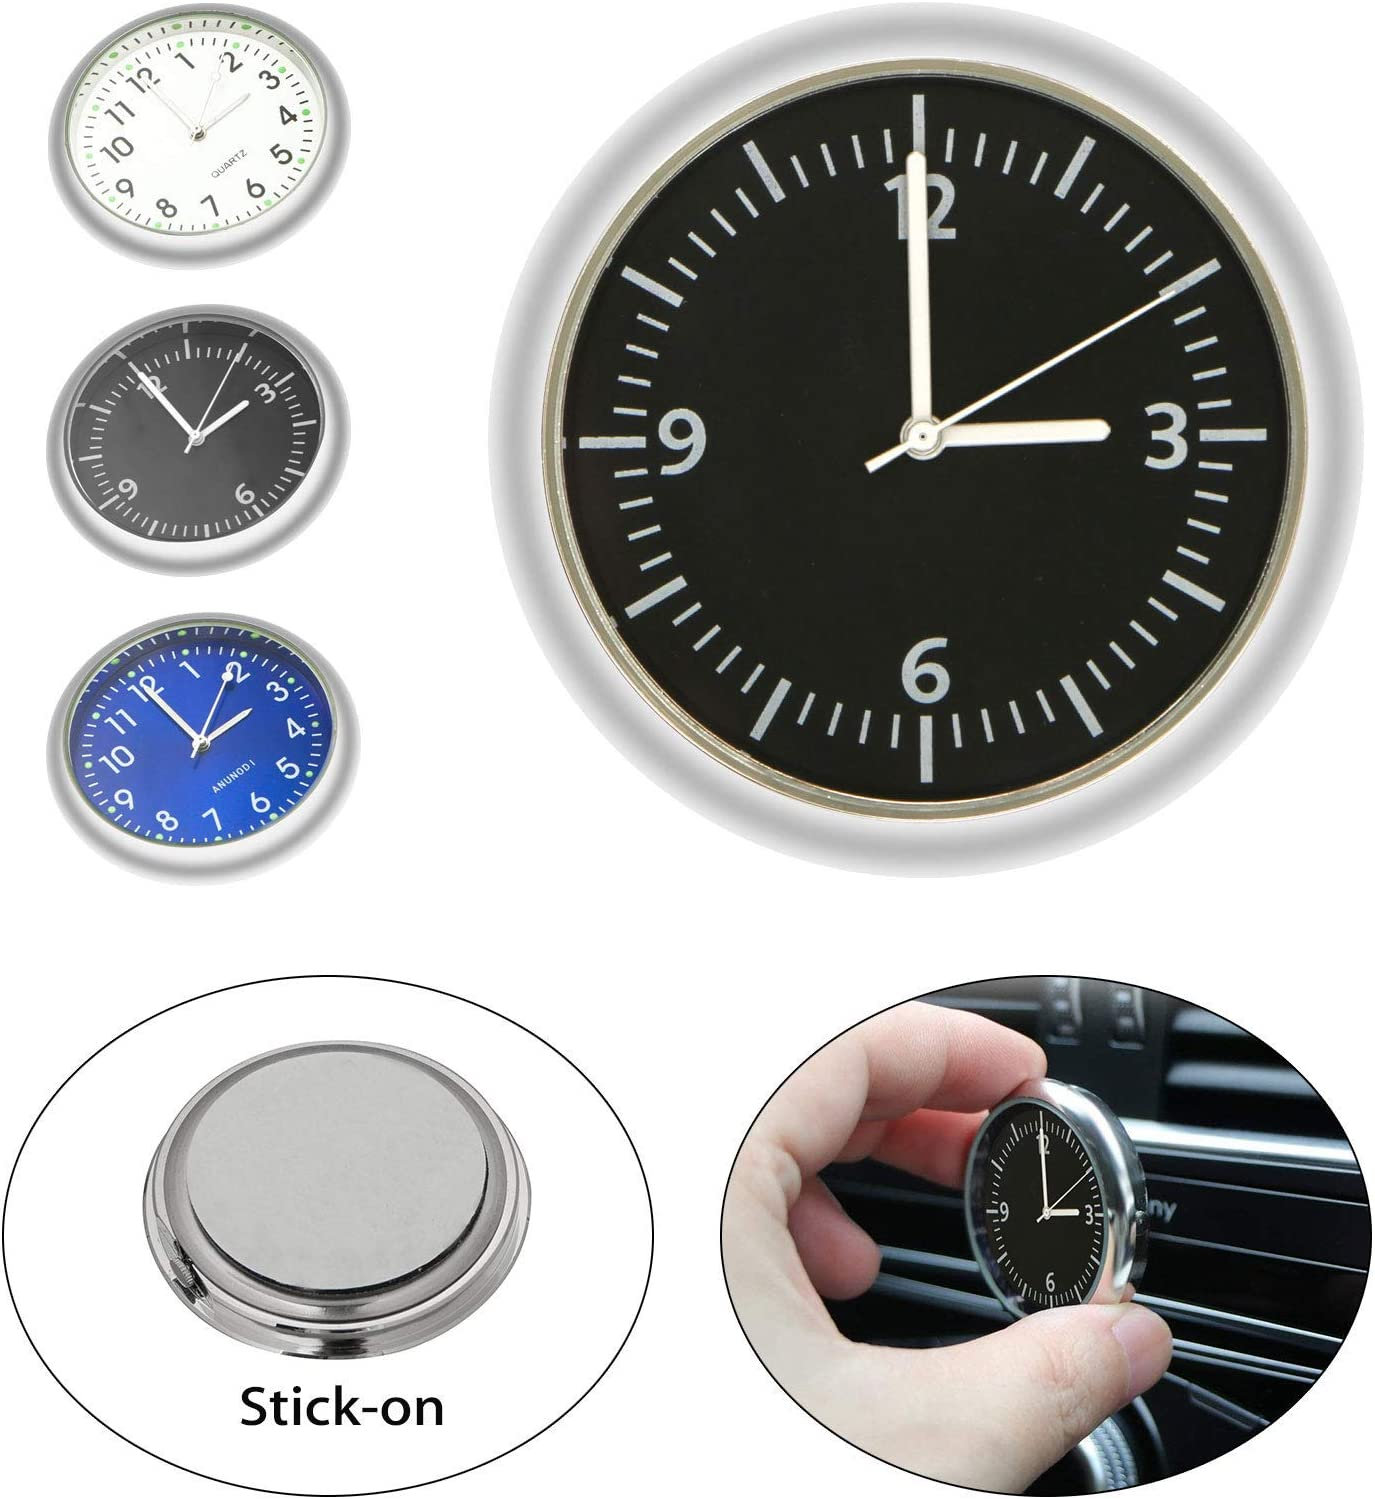 Details about  /Luminous Interior Portable Stick On Self Adhesive Analog Car Clock Decoration